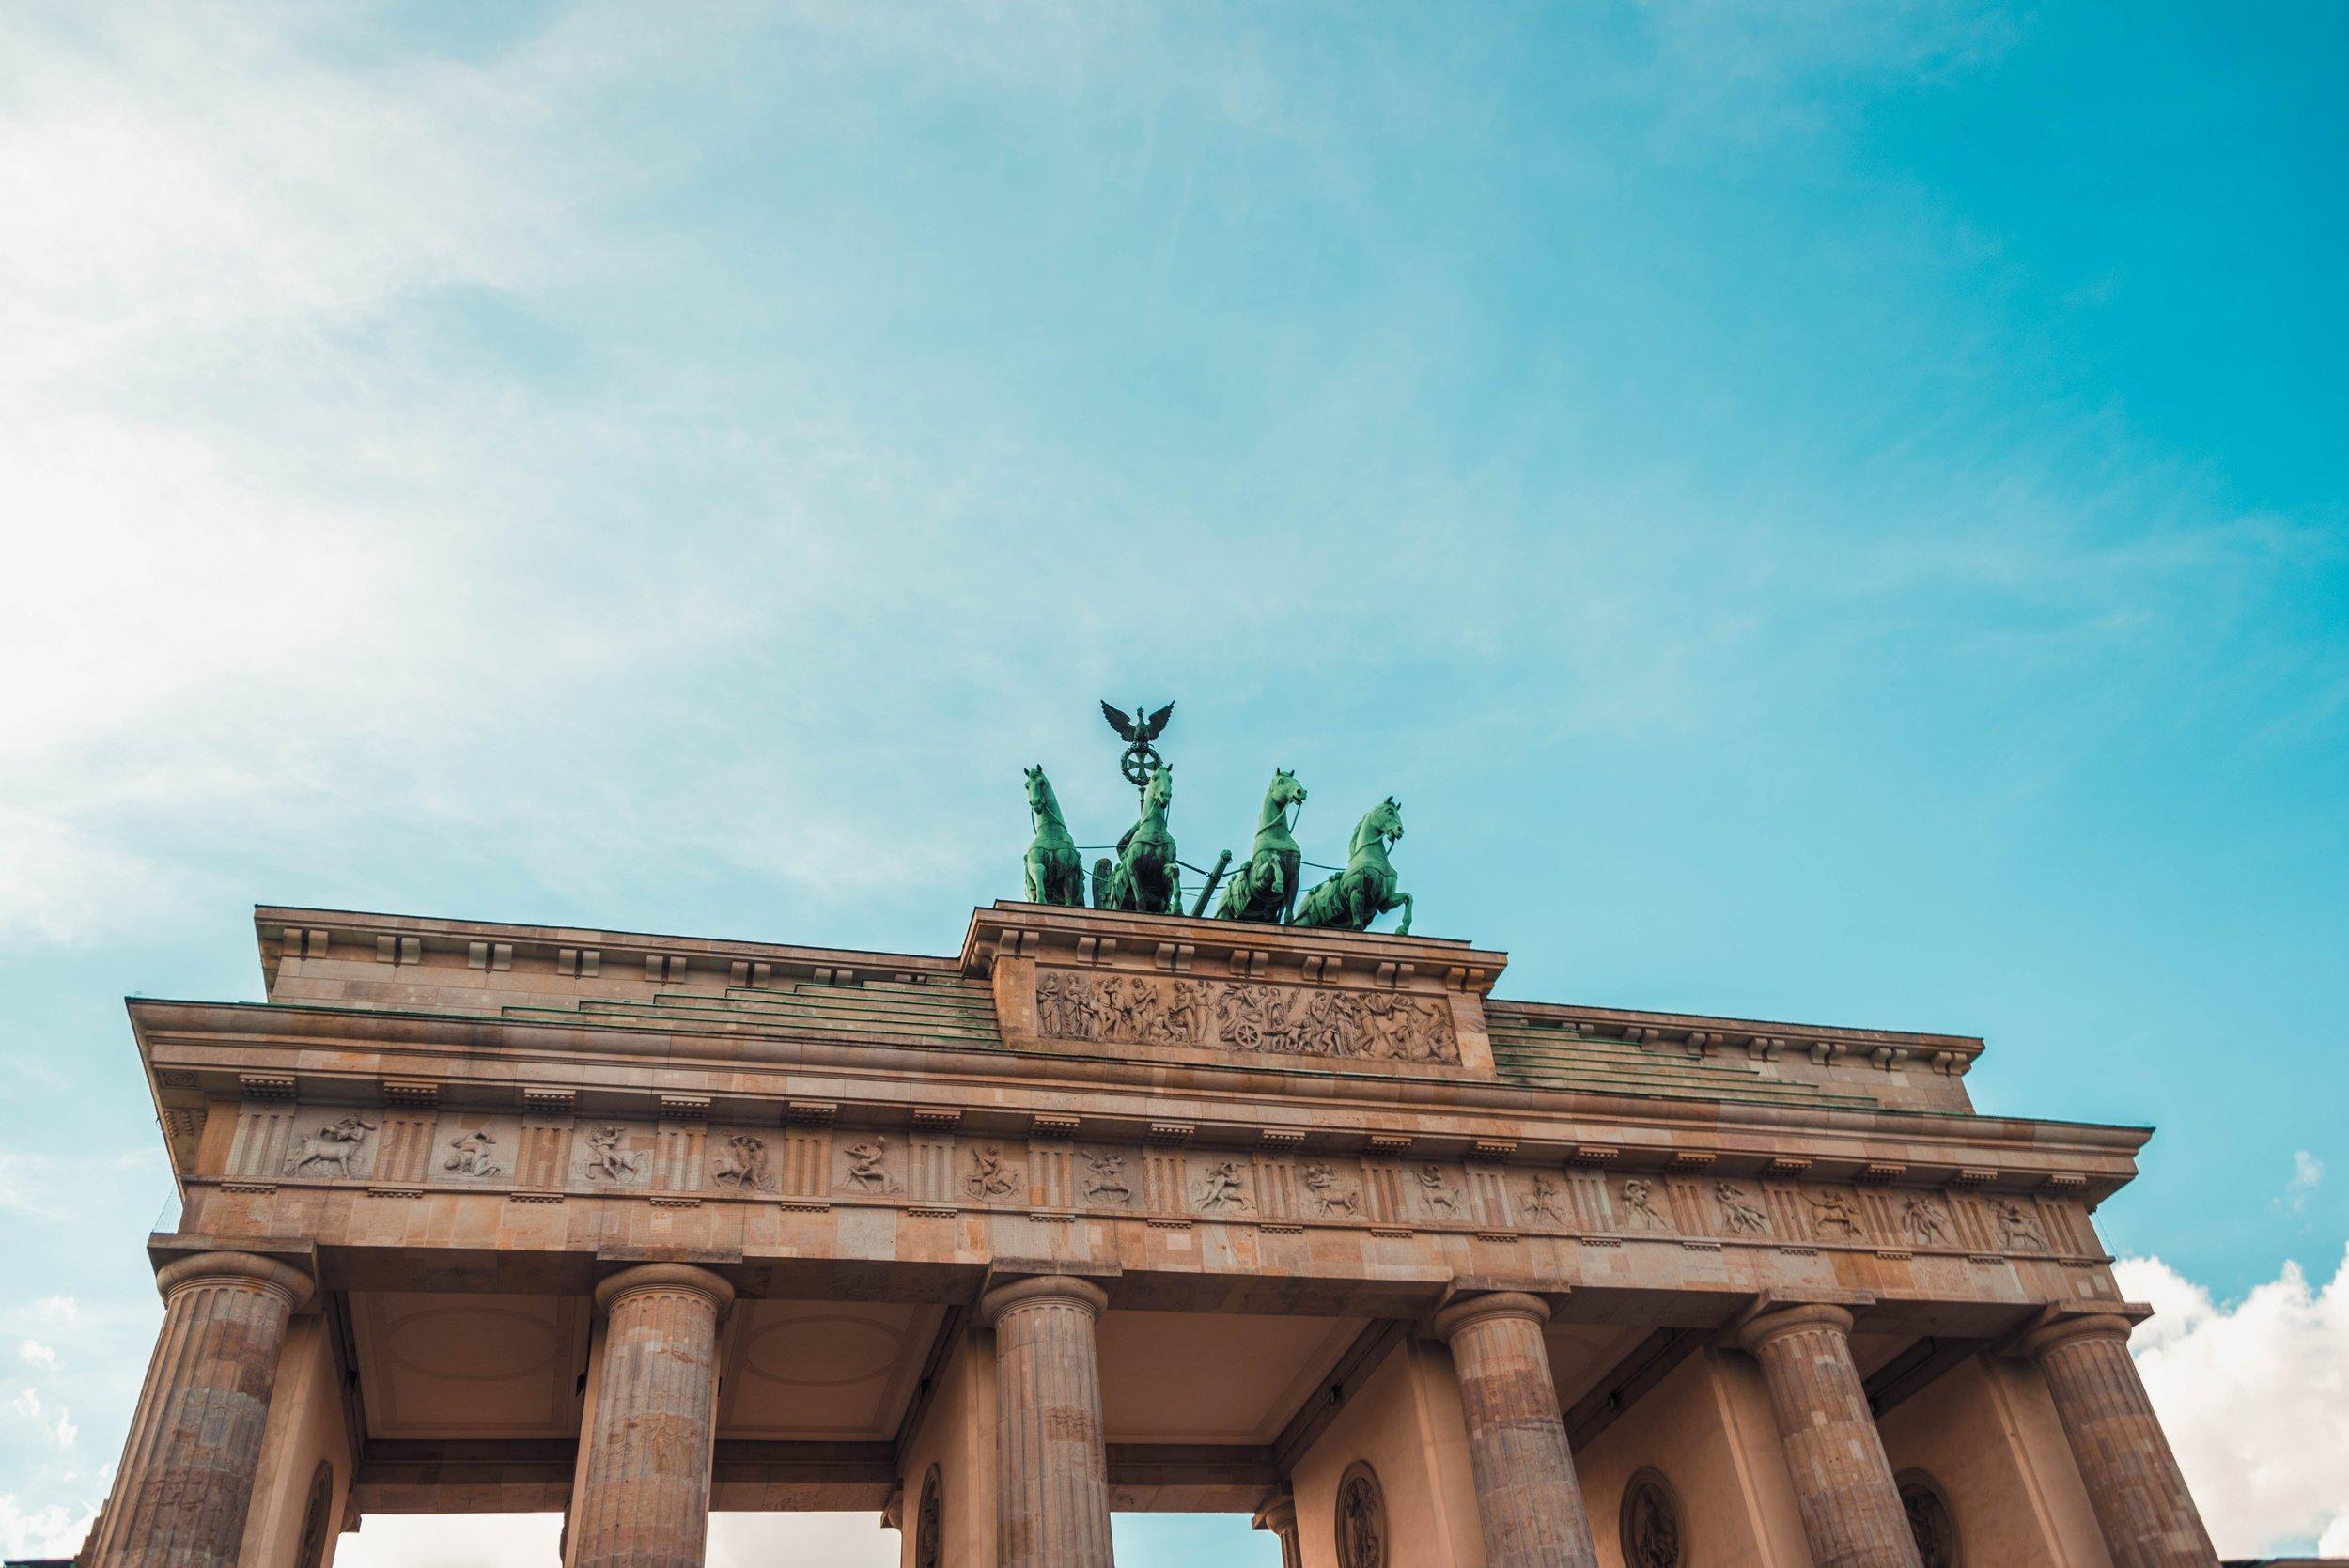 berlin_germany.jpg